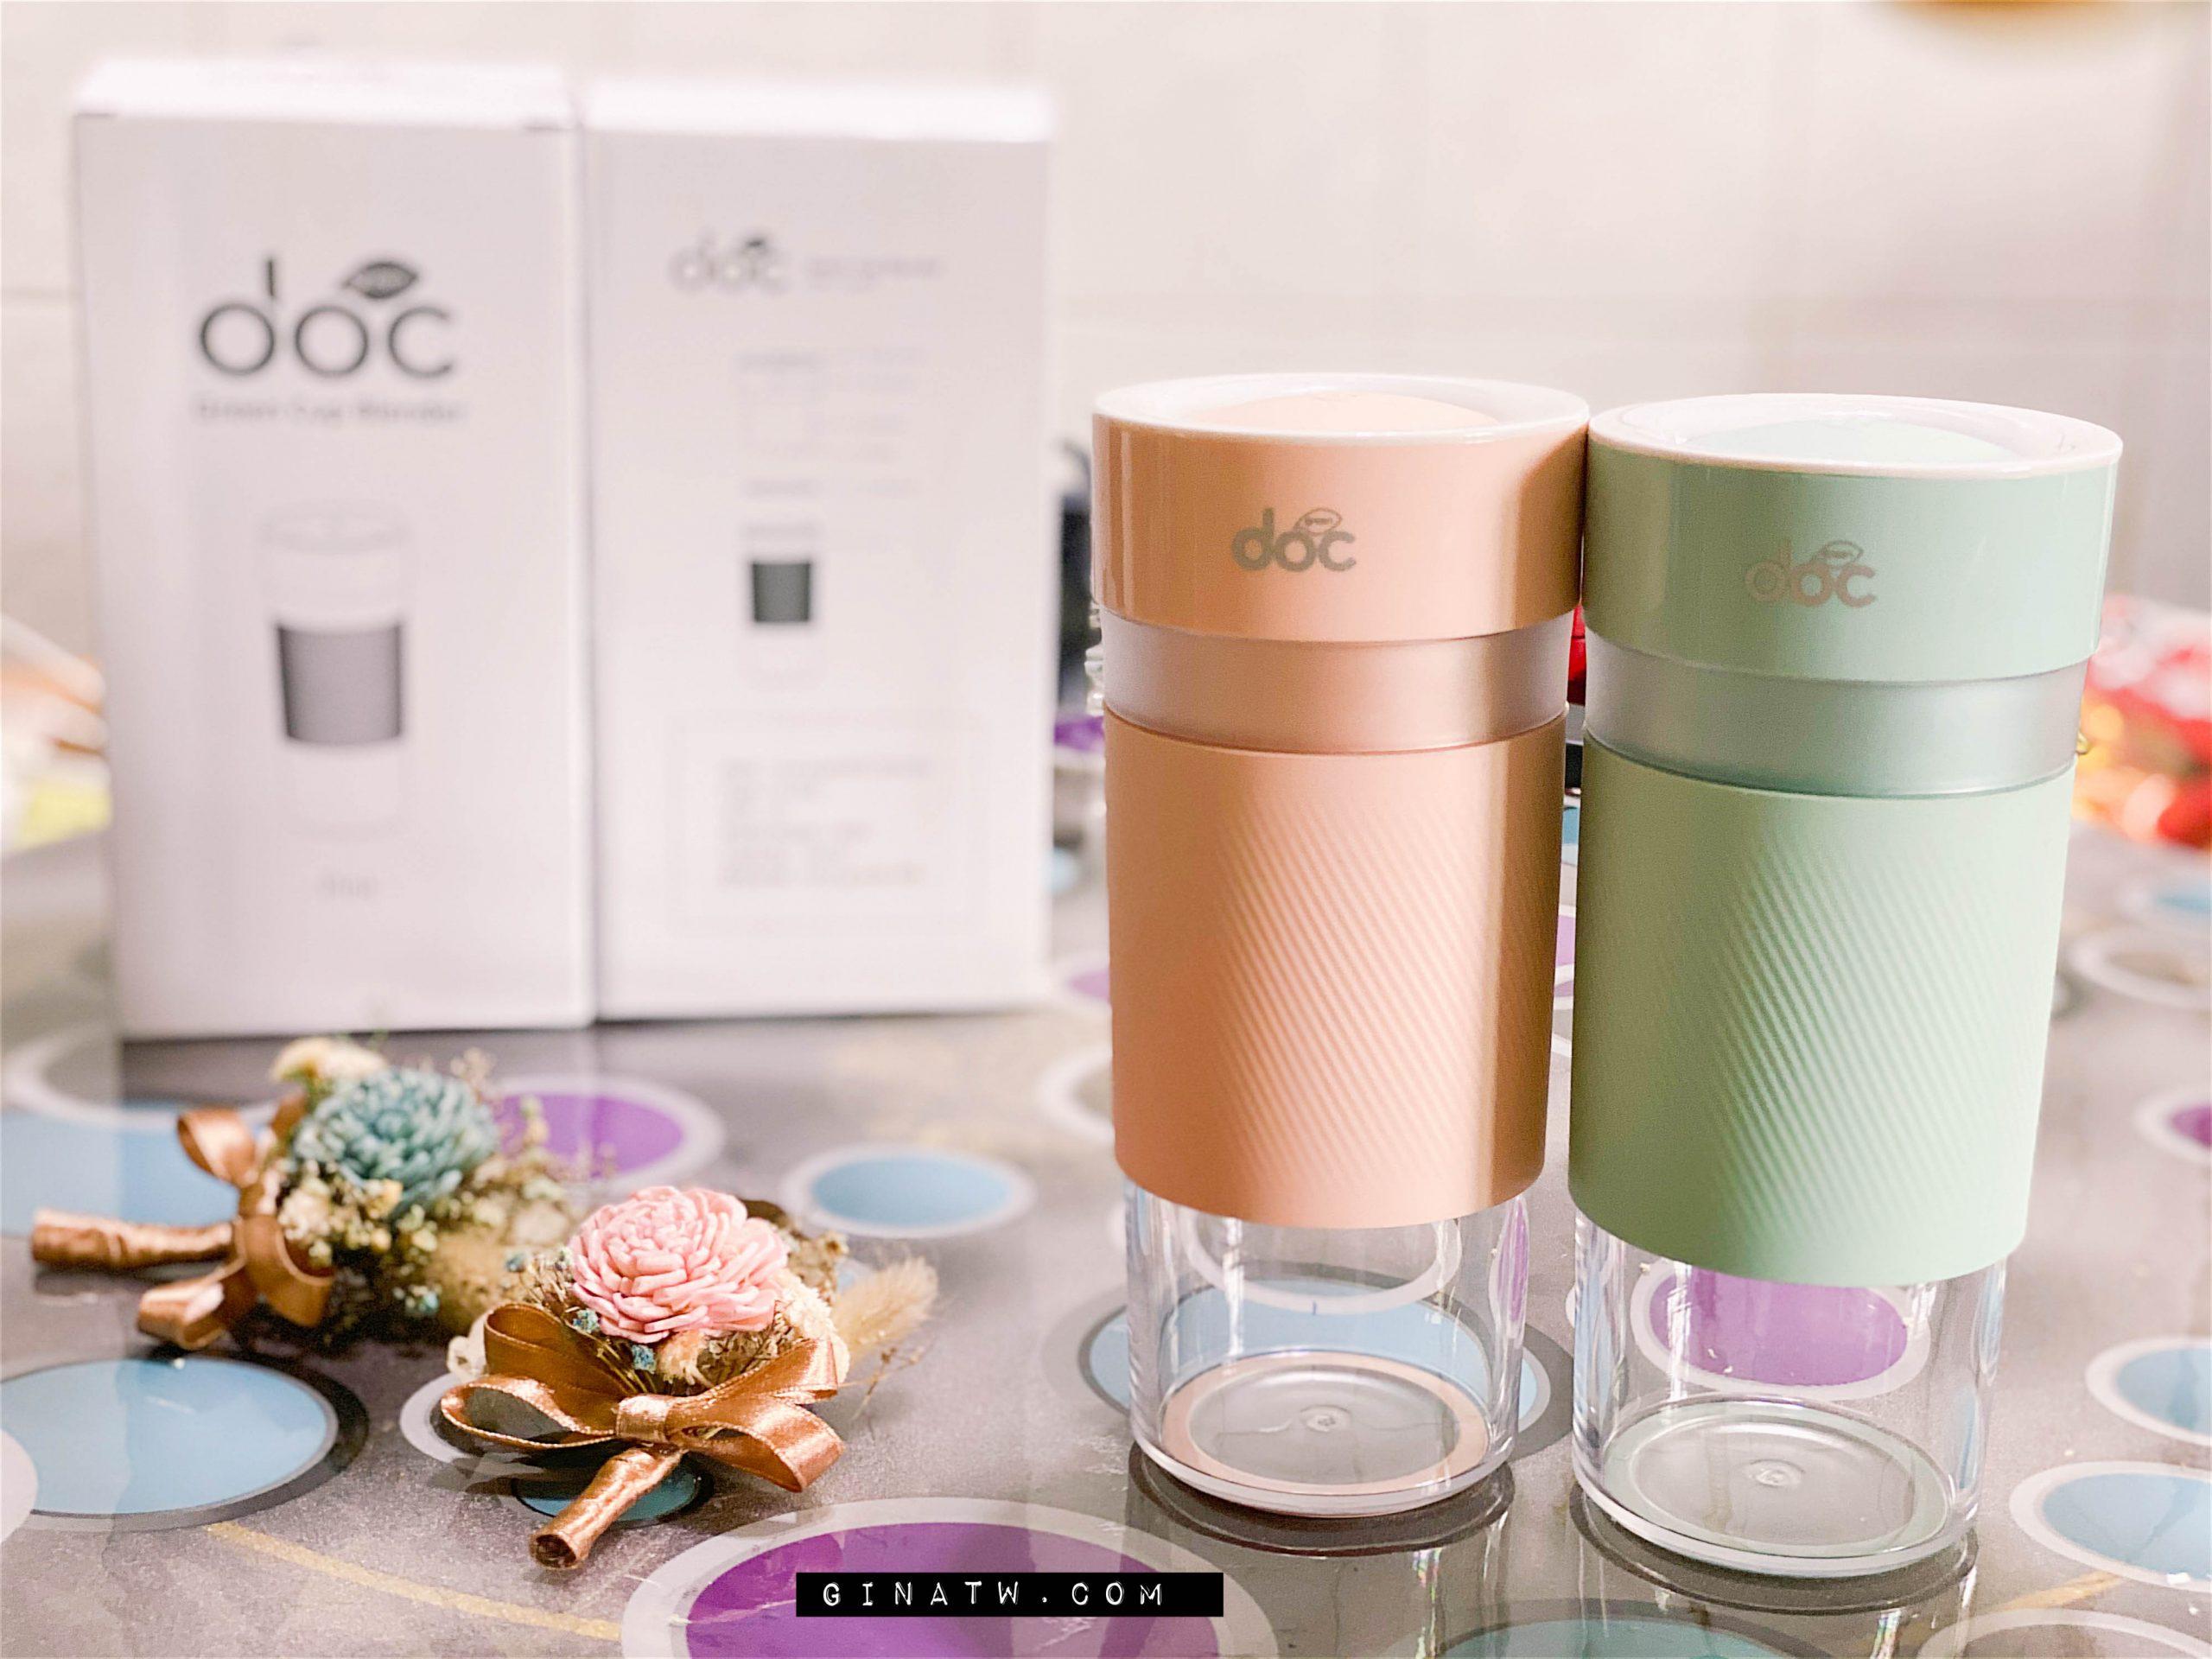 【Doc Green 輕享杯】奧地利Green Cup隨行杯|果汁機團購|時尚質感USB充電果汁機 @GINA環球旅行生活|不會韓文也可以去韓國